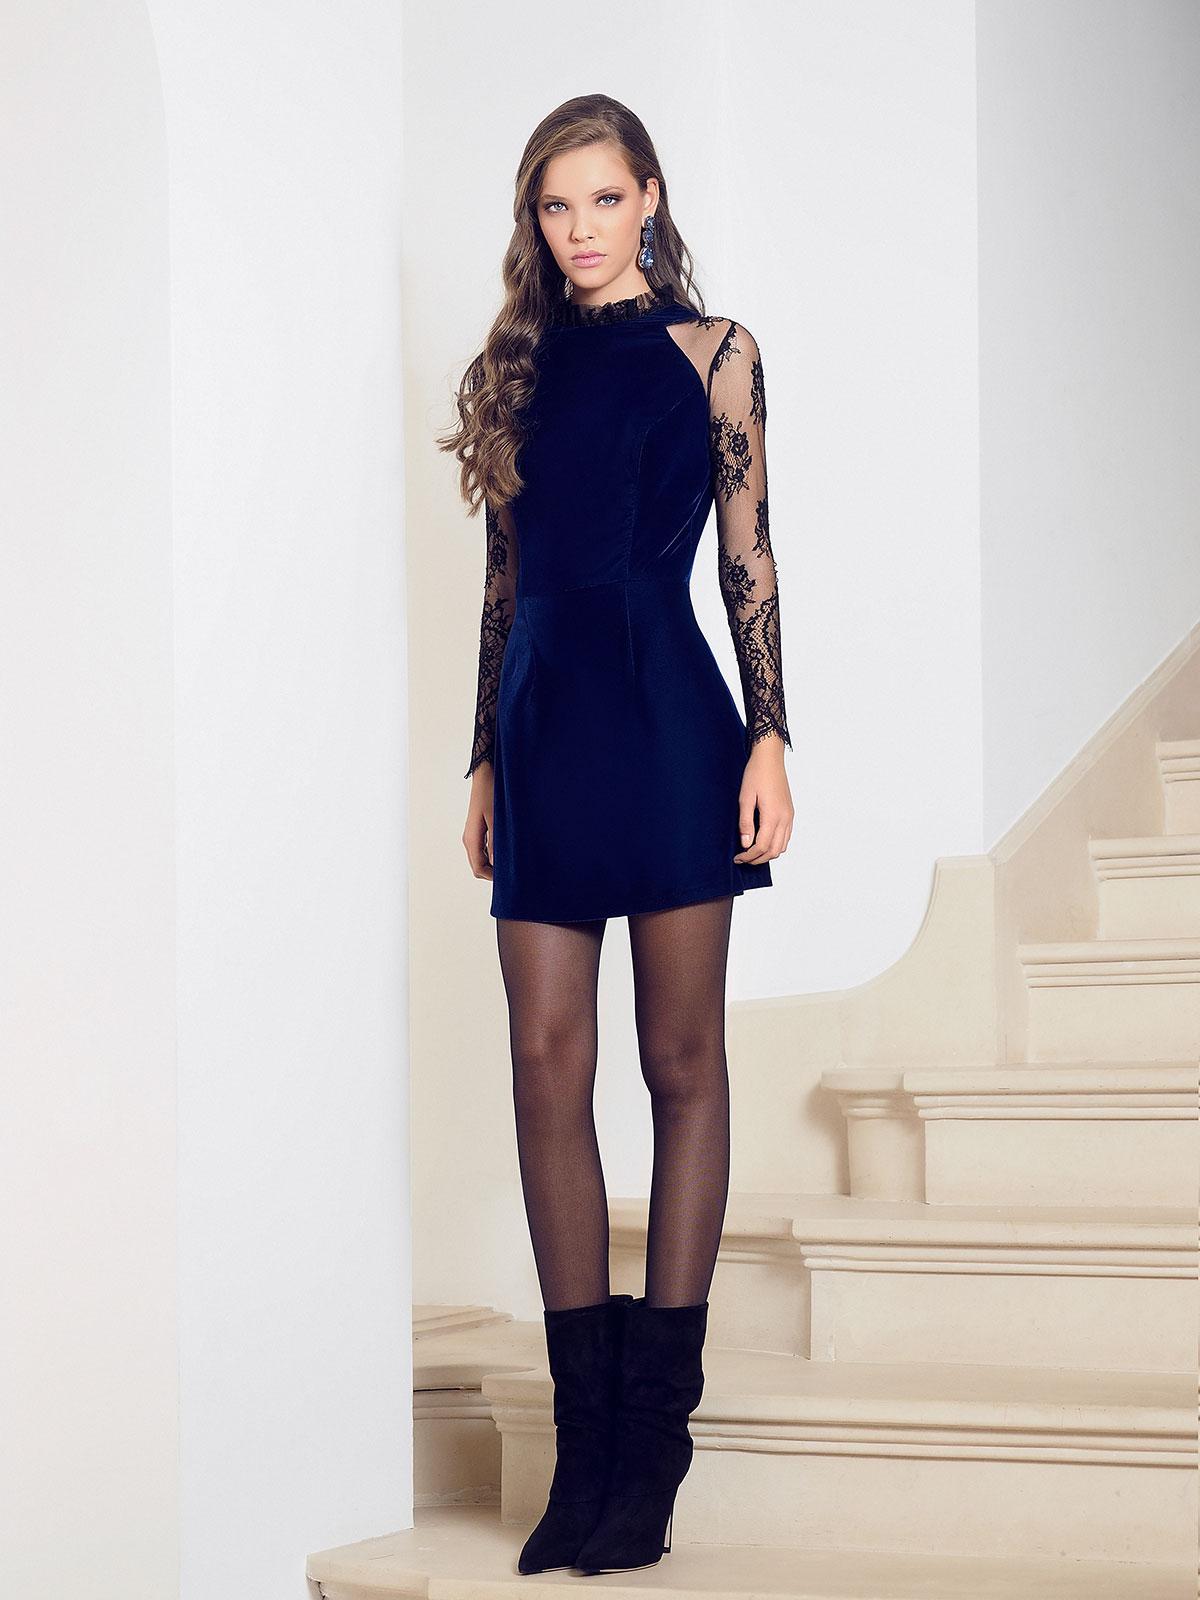 Adrielle Chantilly lace-trimmed silk velvet mini dress M Marquise image 5